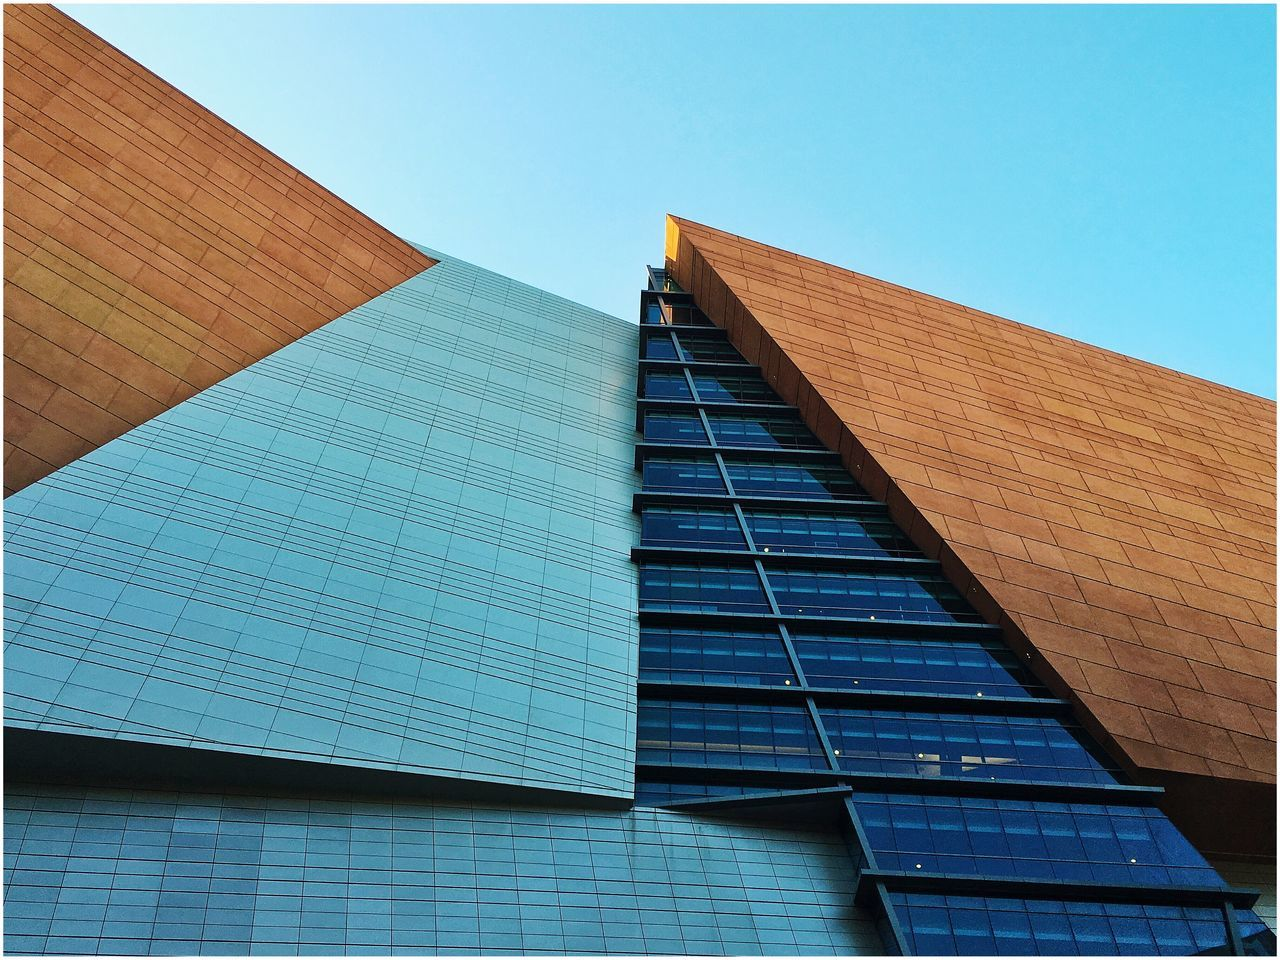 Beautiful stock photos of las vegas, architecture, no people, built structure, building exterior